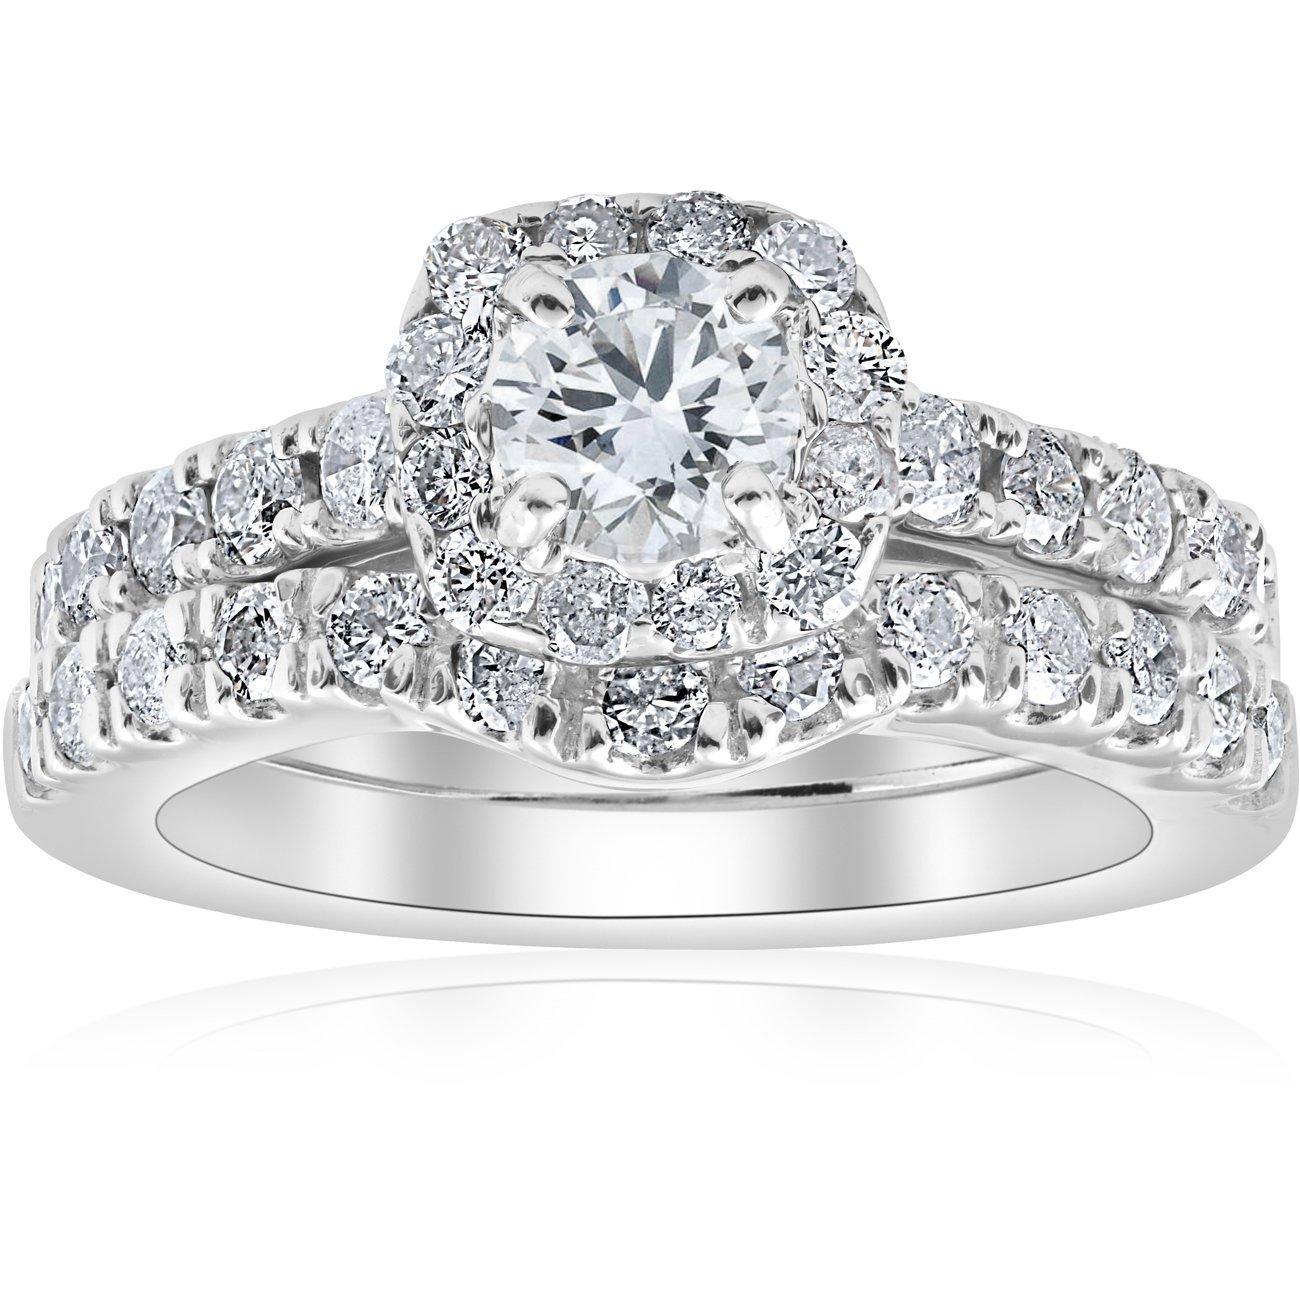 1 1/4ct Cushion Halo Diamond Engagement Matching Wedding Ring Set 14K White Gold